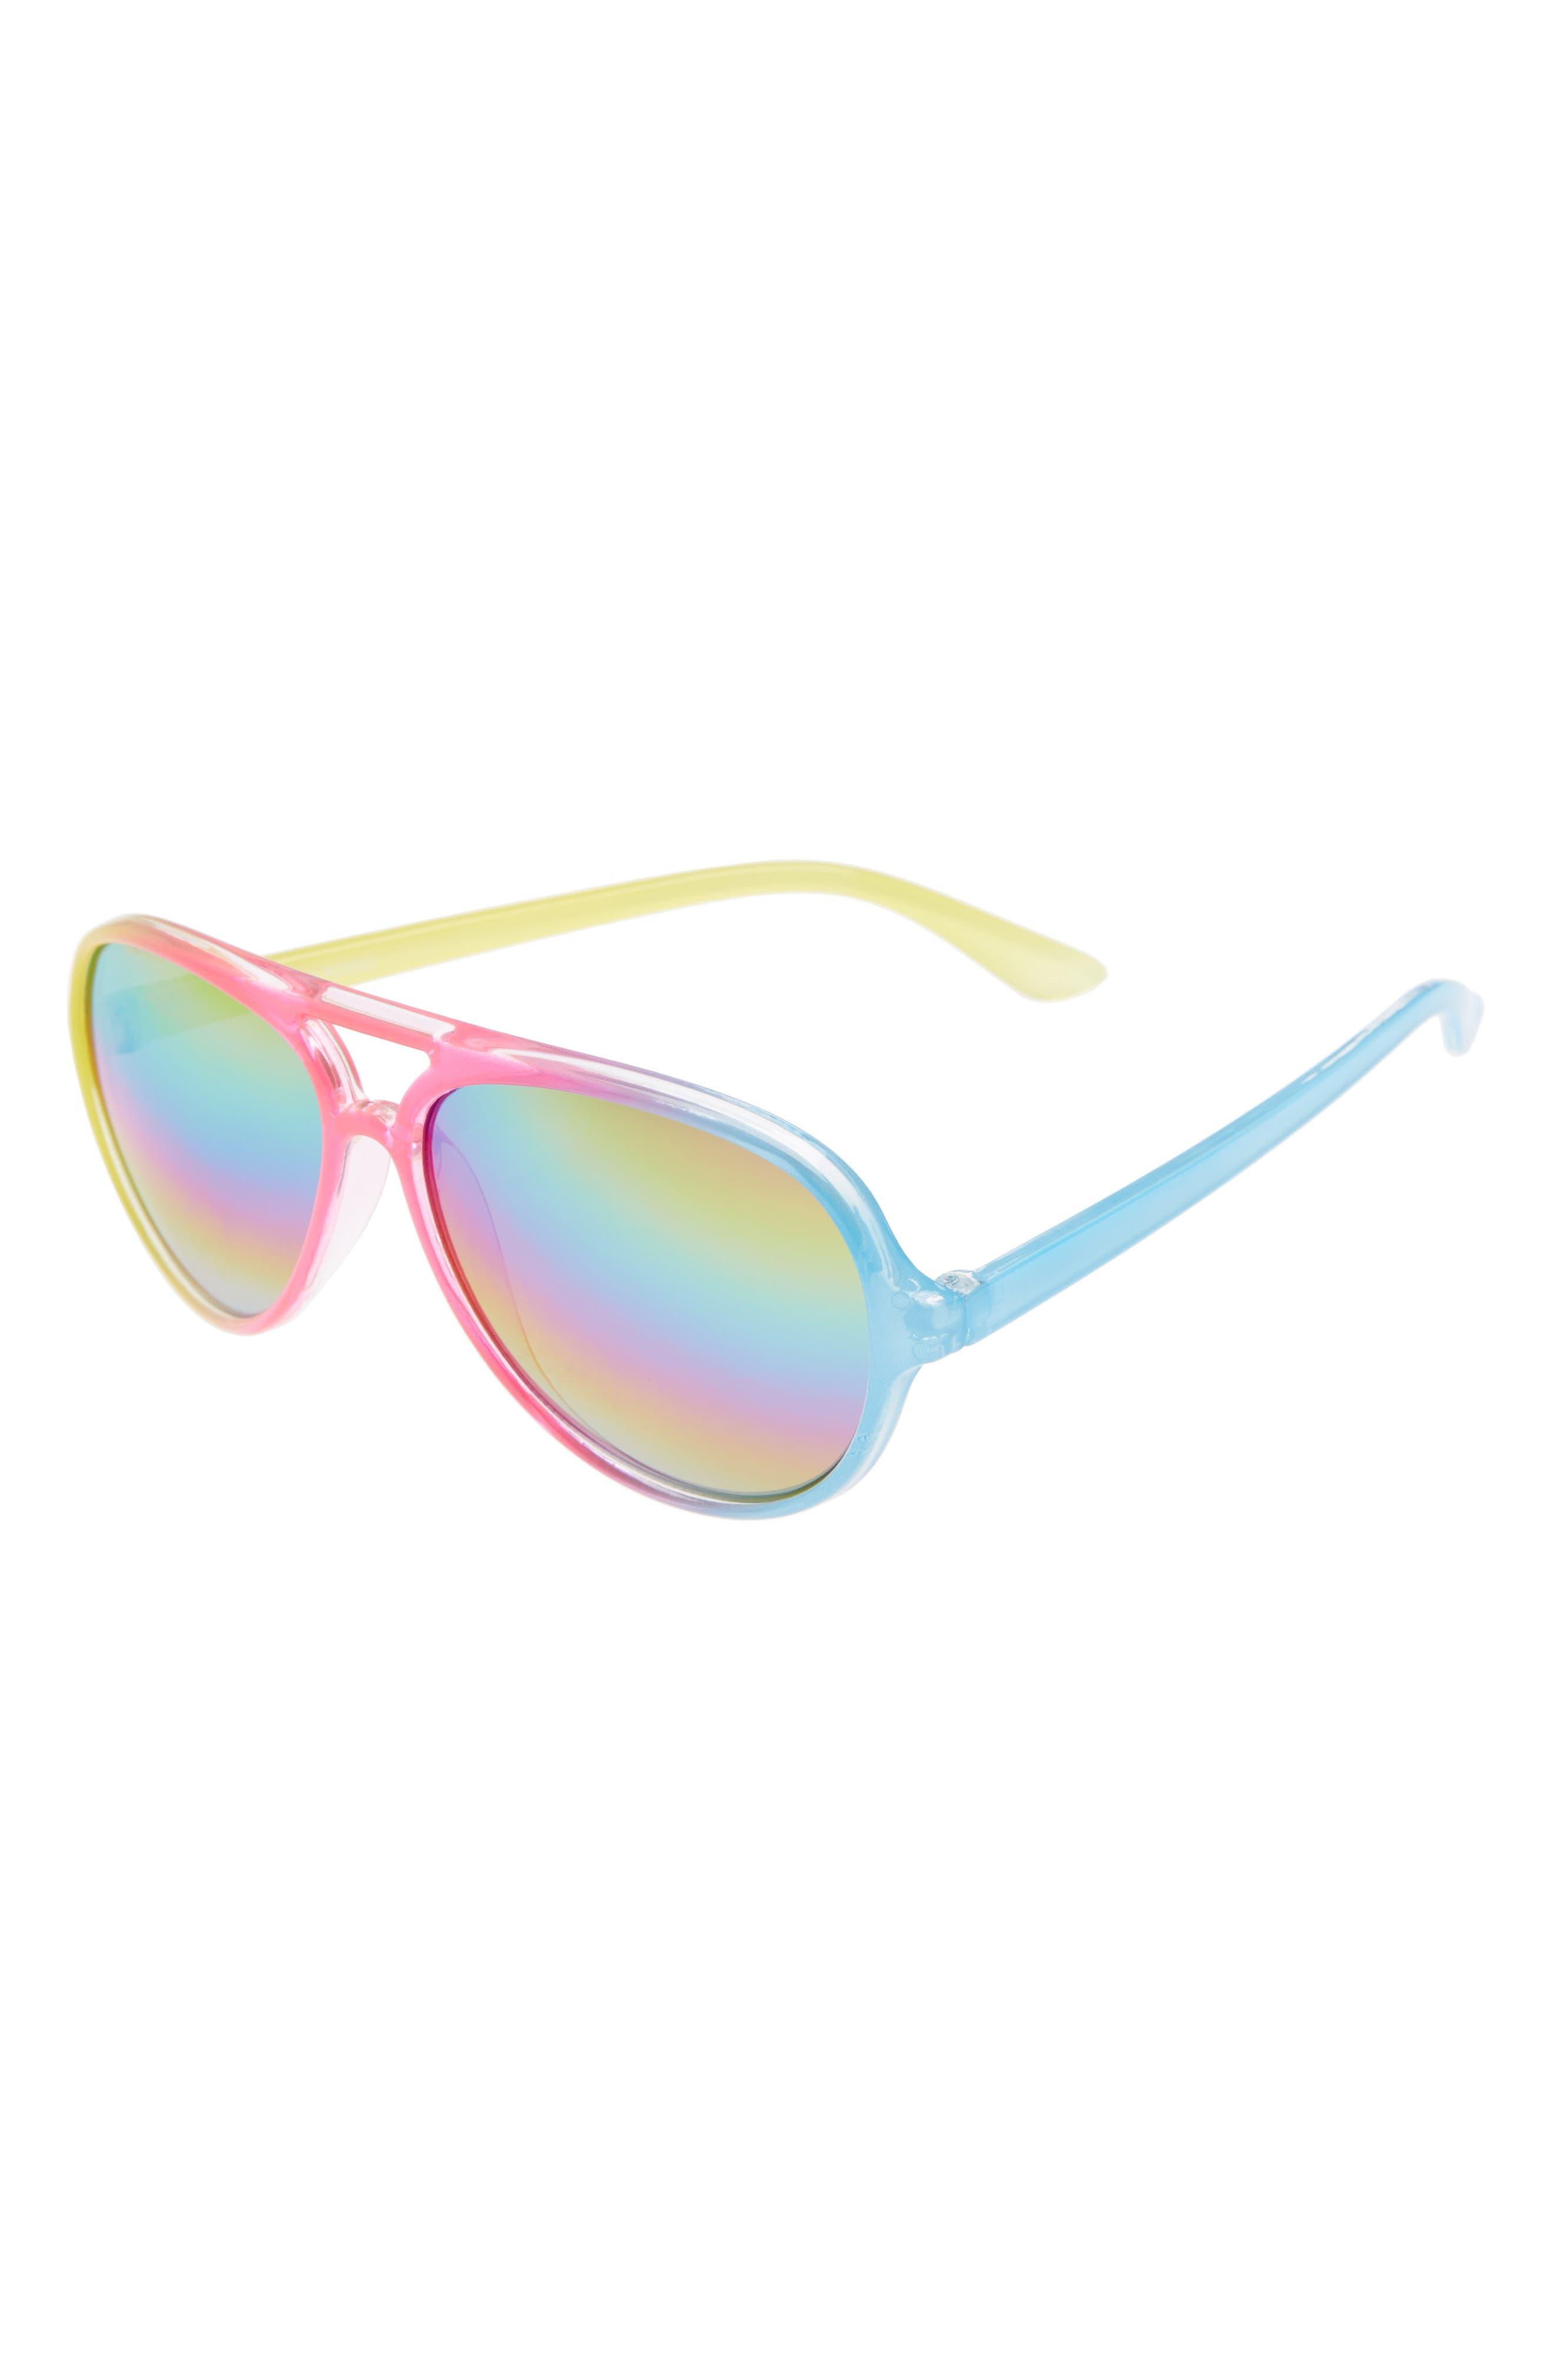 Loose Leaf Eyewear Rainbow Carrera Aviator Sunglasses (Baby)